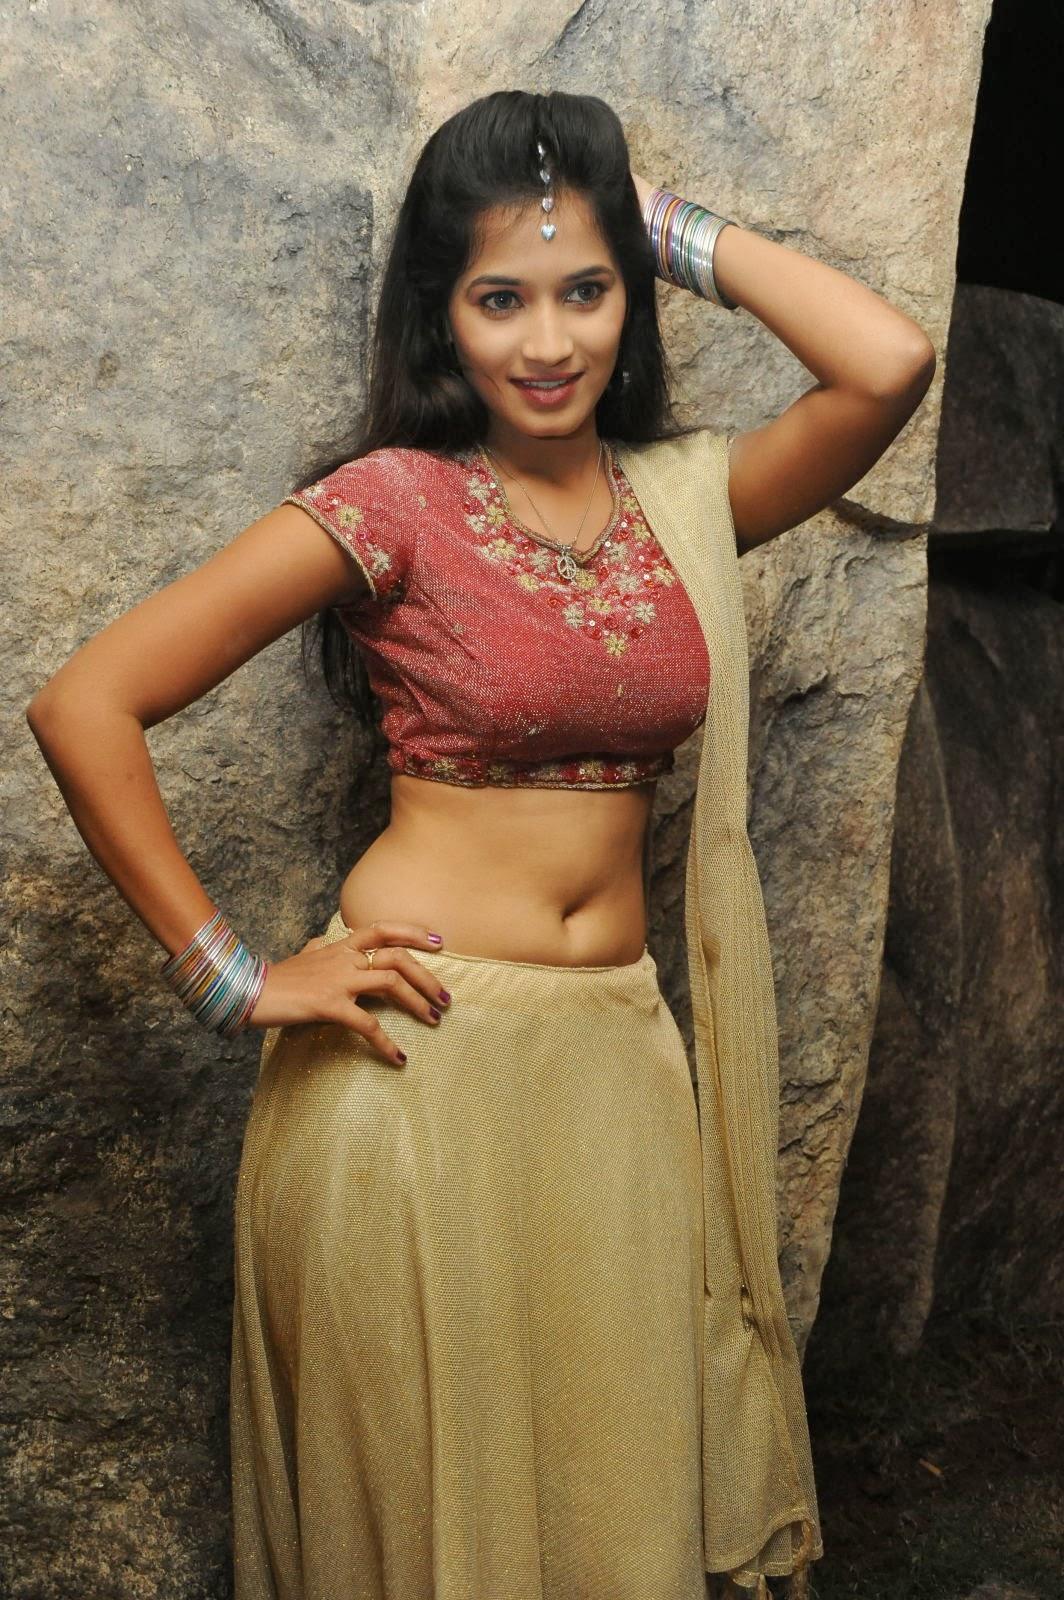 Tamil cute Indian bhabhi